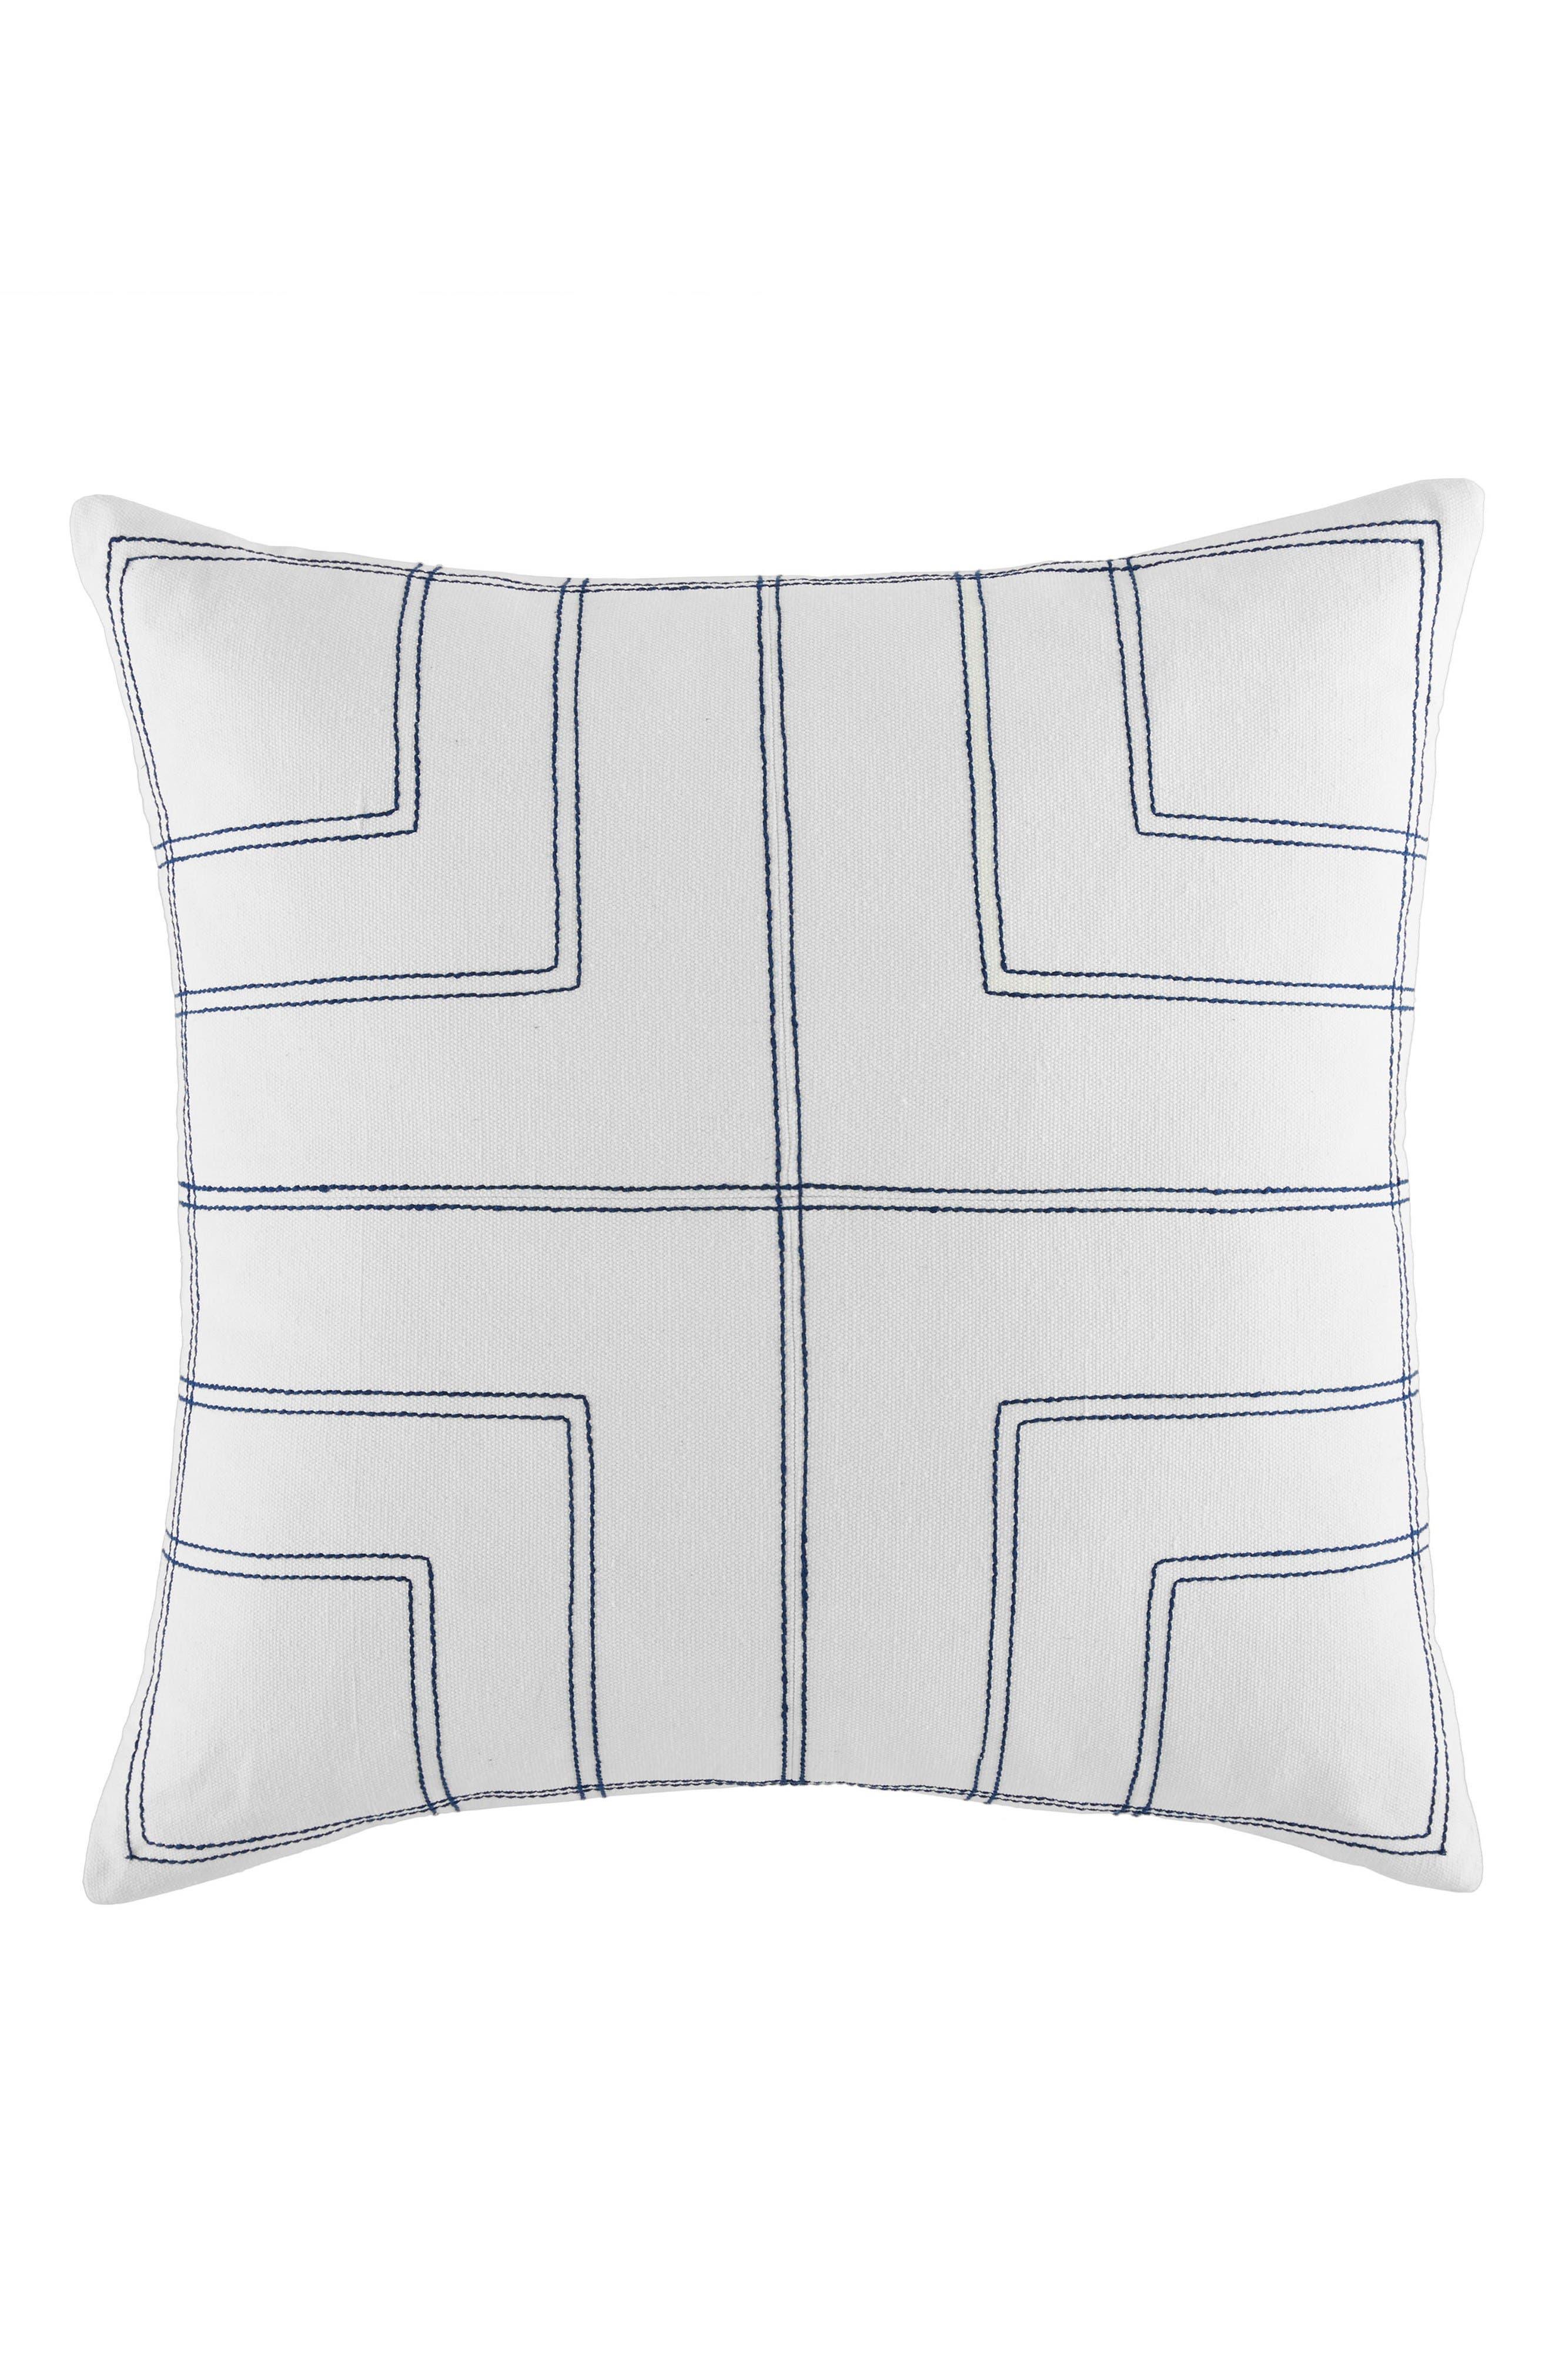 Main Image - Tommy Hilfiger Quadrant Accent Pillow